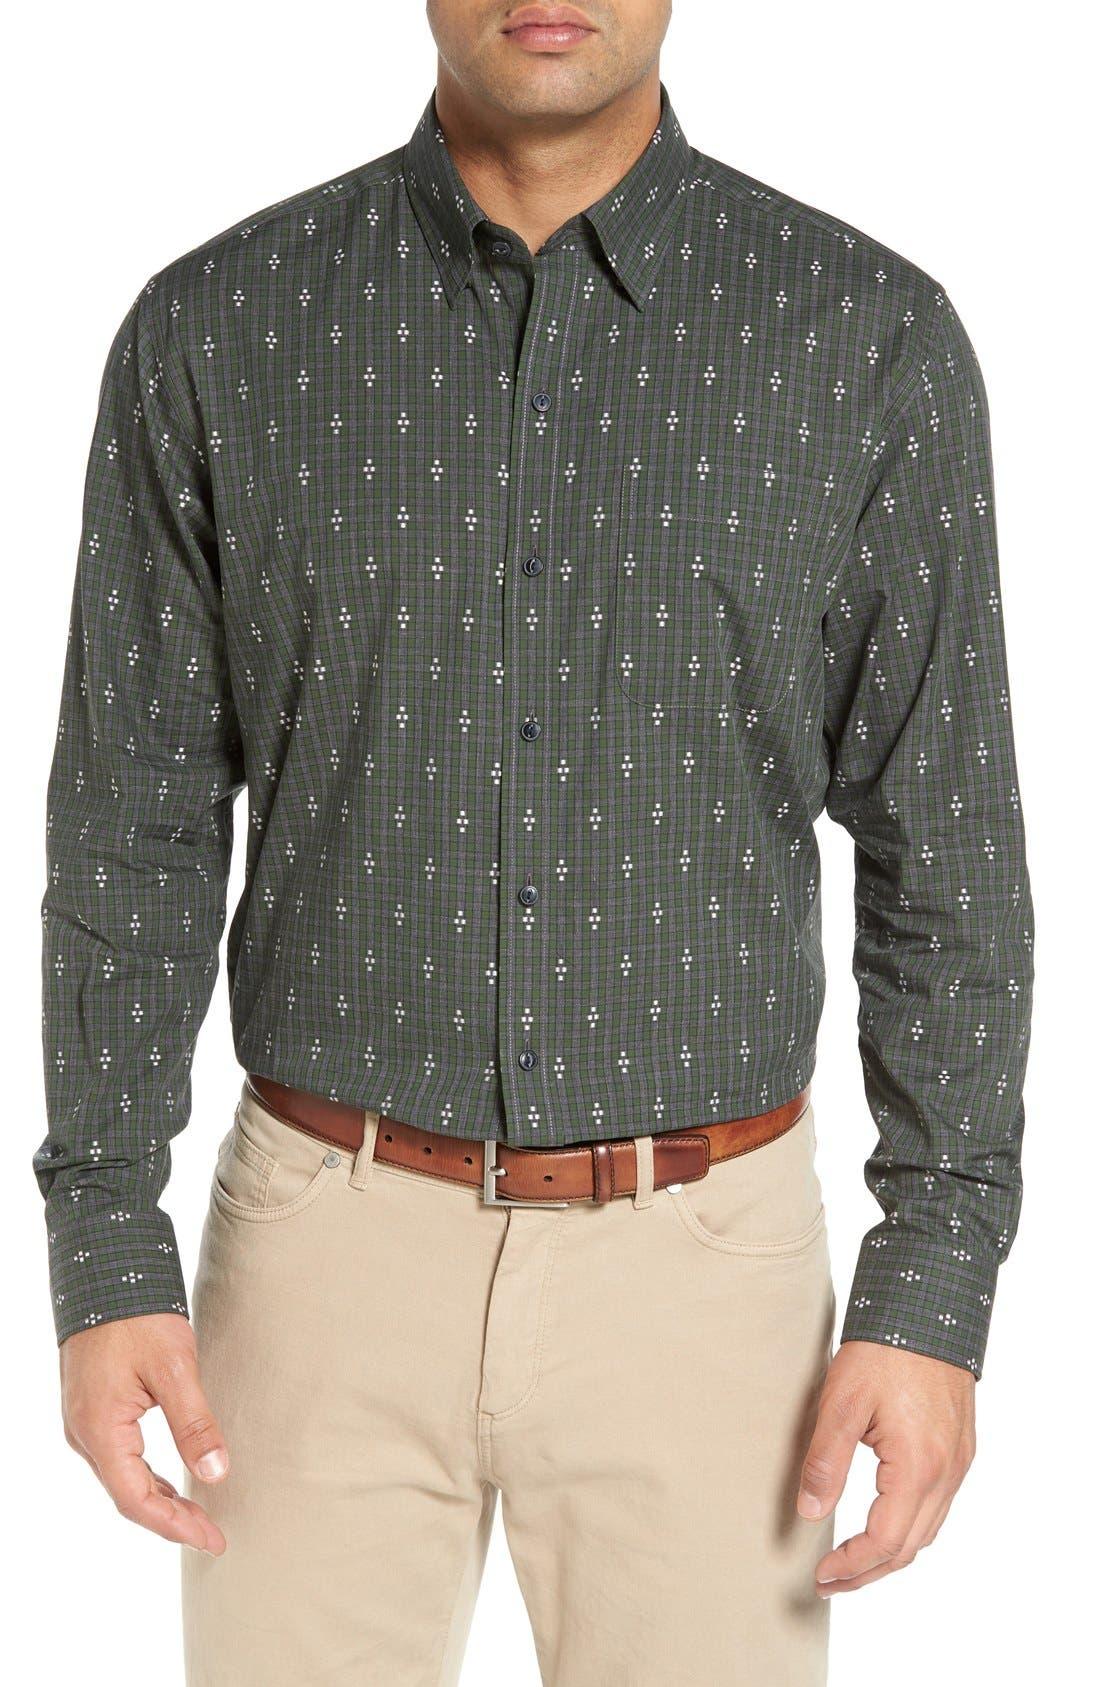 Main Image - Cutter & Buck 'Maxwell' Jacquard Check Sport Shirt (Big & Tall)